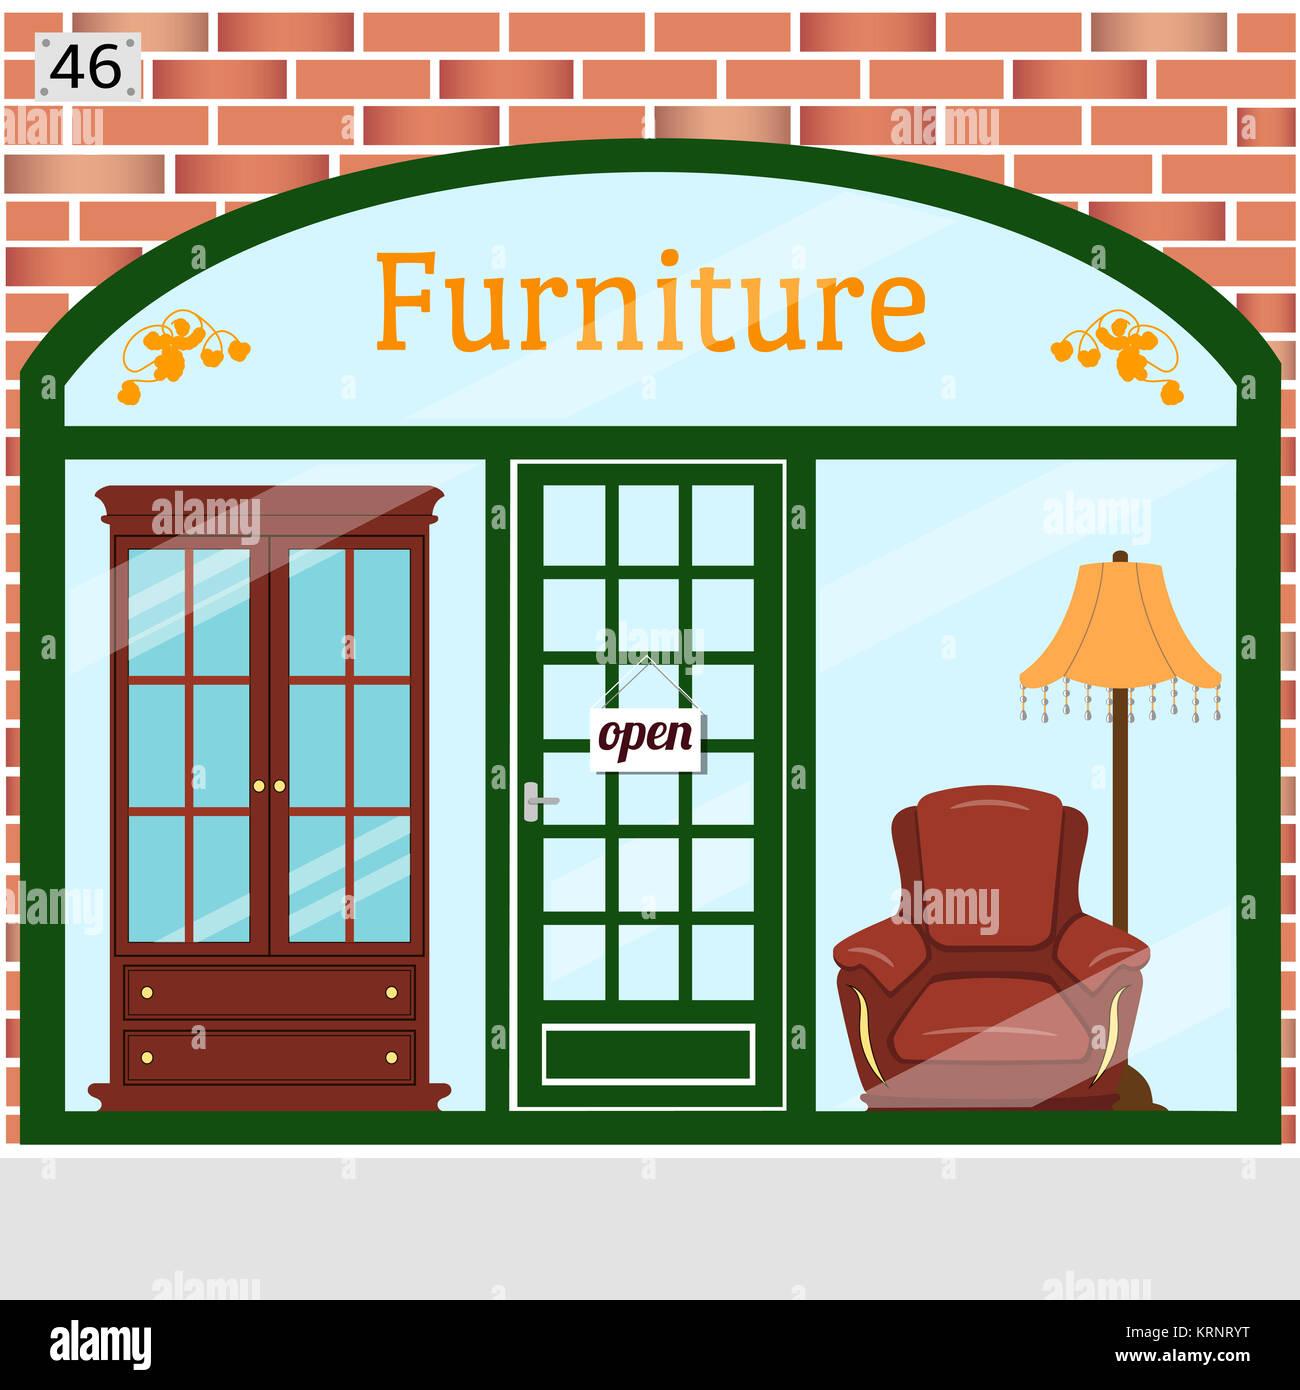 Ashley Furniture Plymouth Meeting Pa: Furniture Shop Interior Colour Stock Photos & Furniture